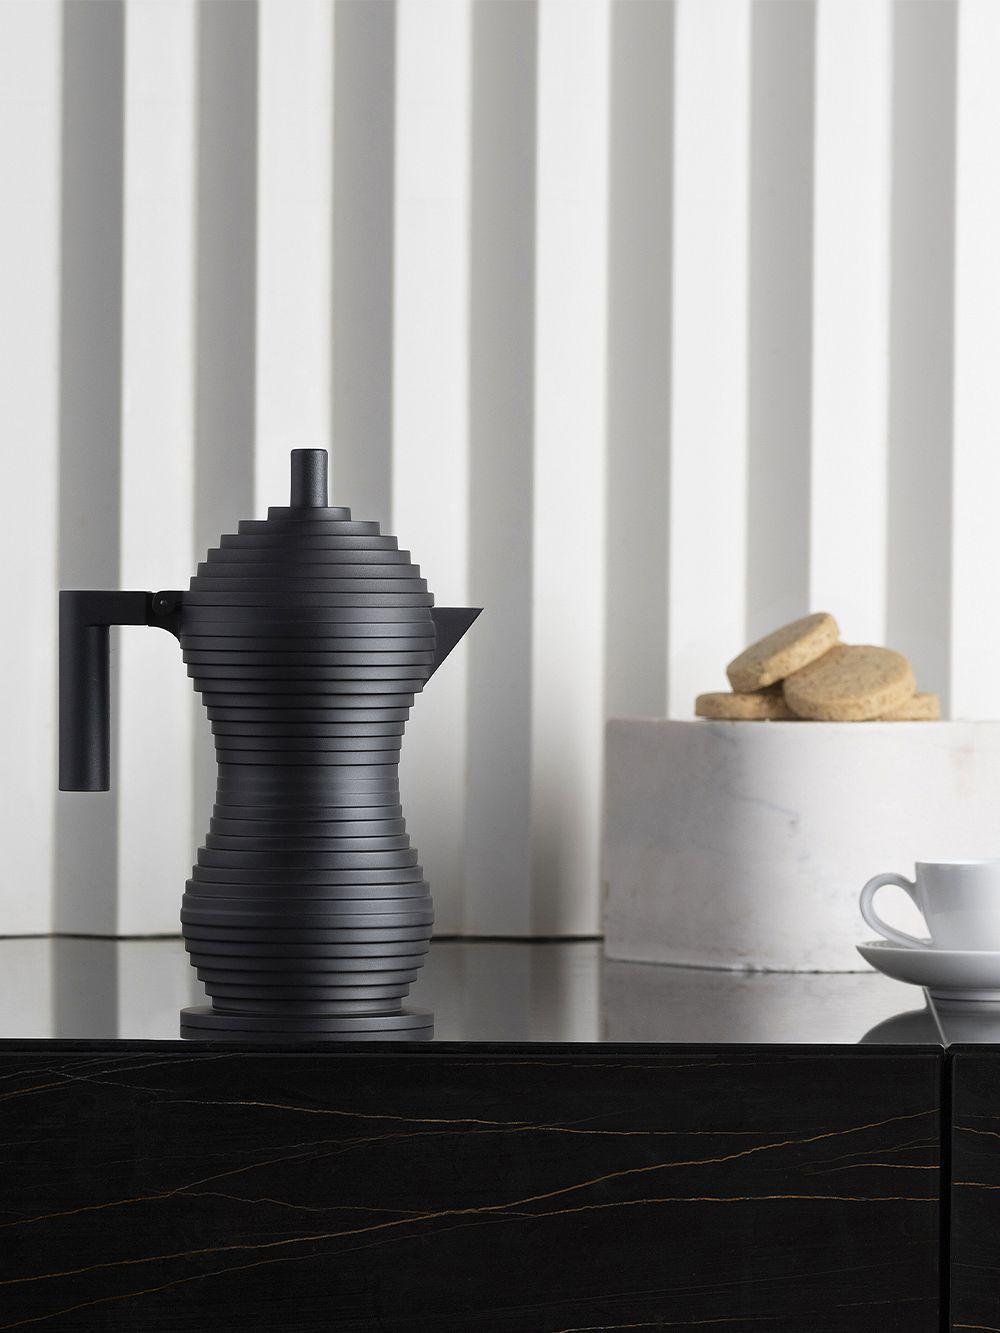 Alessi Pulcina espresso coffee maker, 3 cups, black